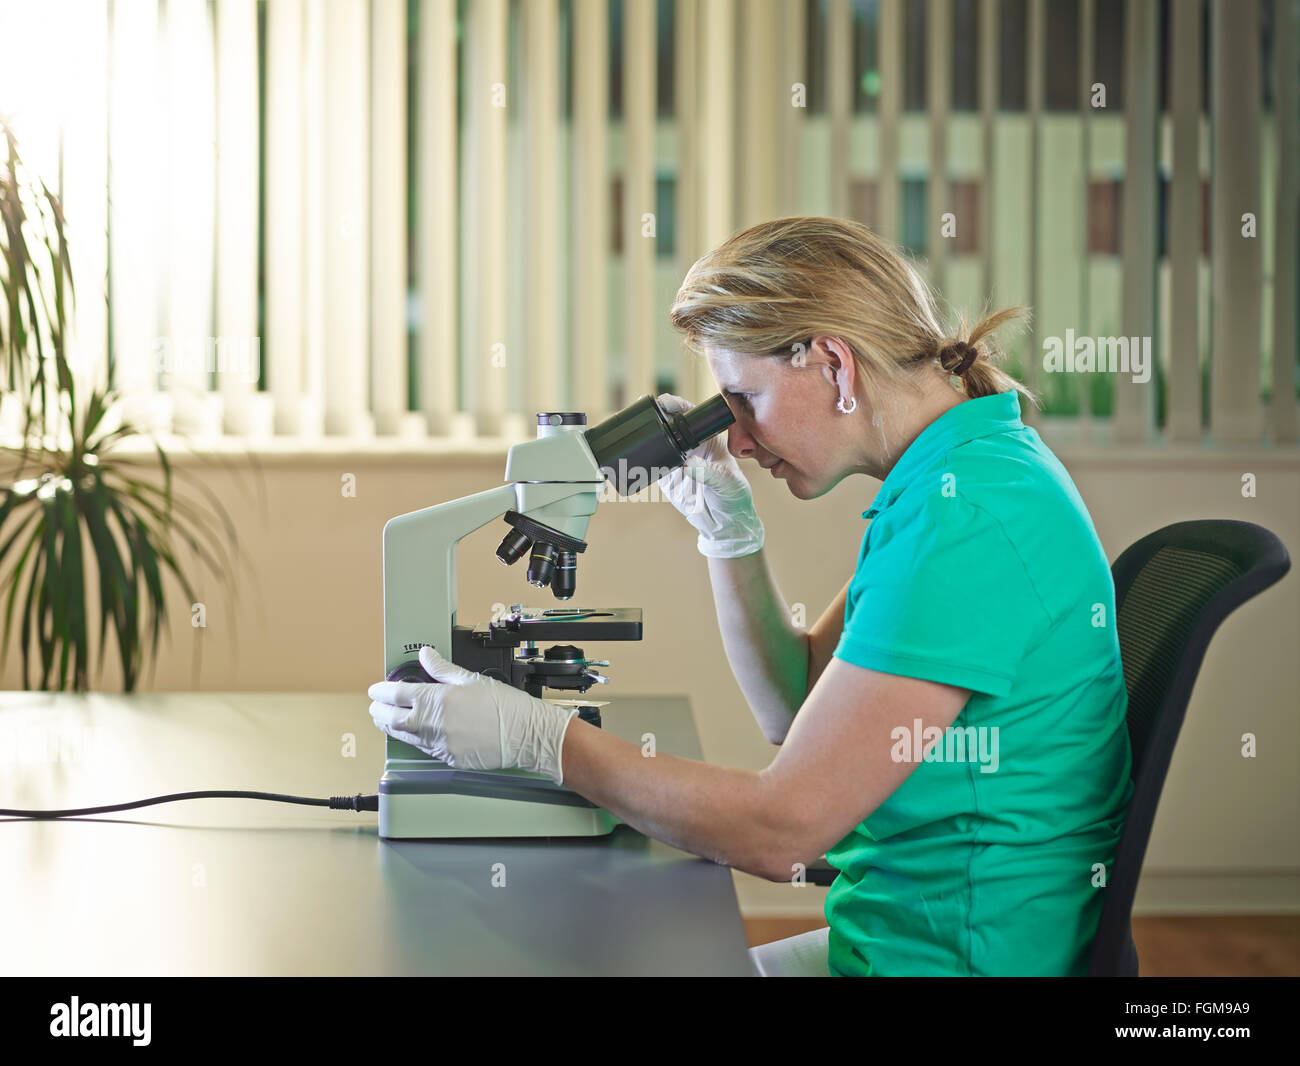 Nurse, doctor looking through microscope, Austria - Stock Image